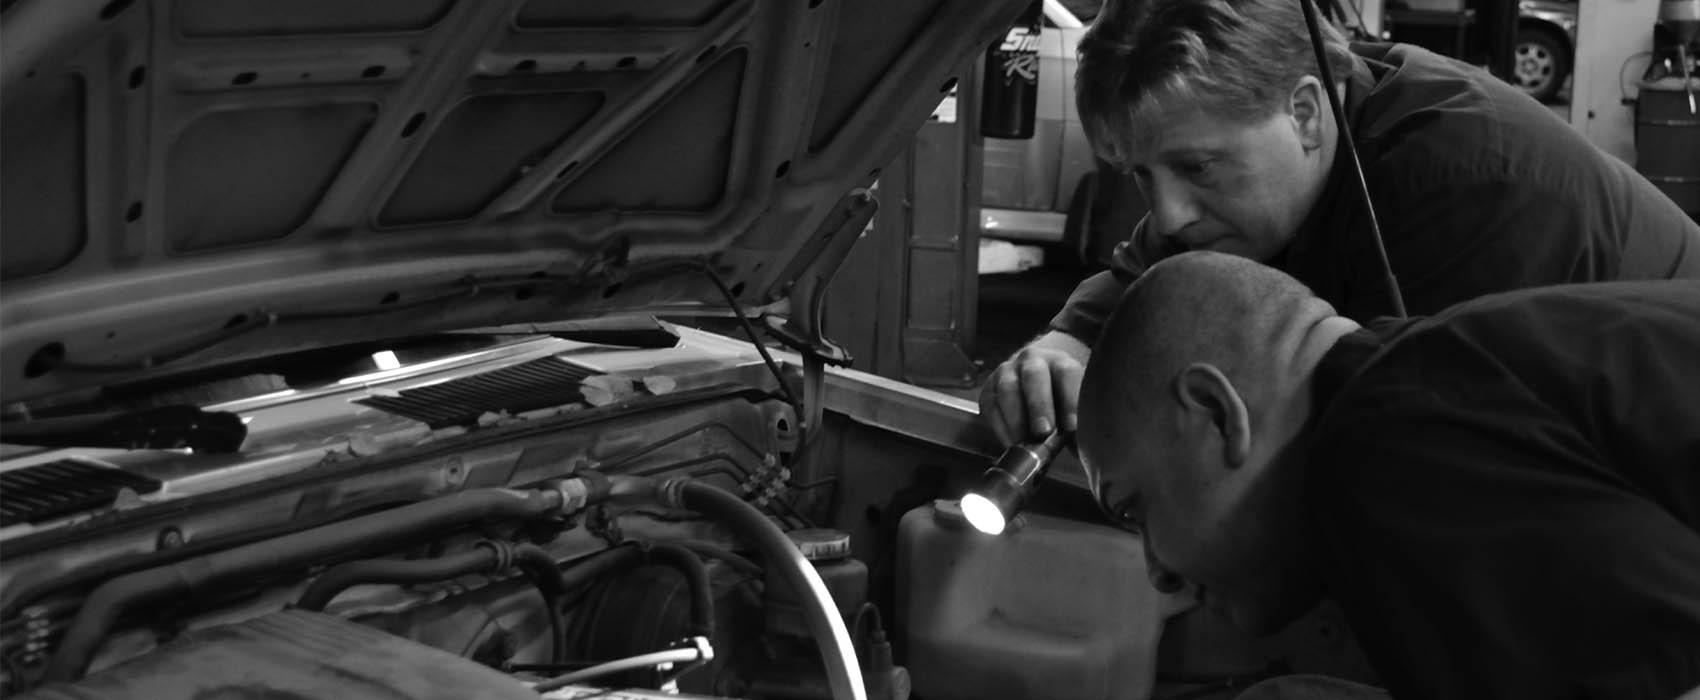 anchorage-import-car-repair